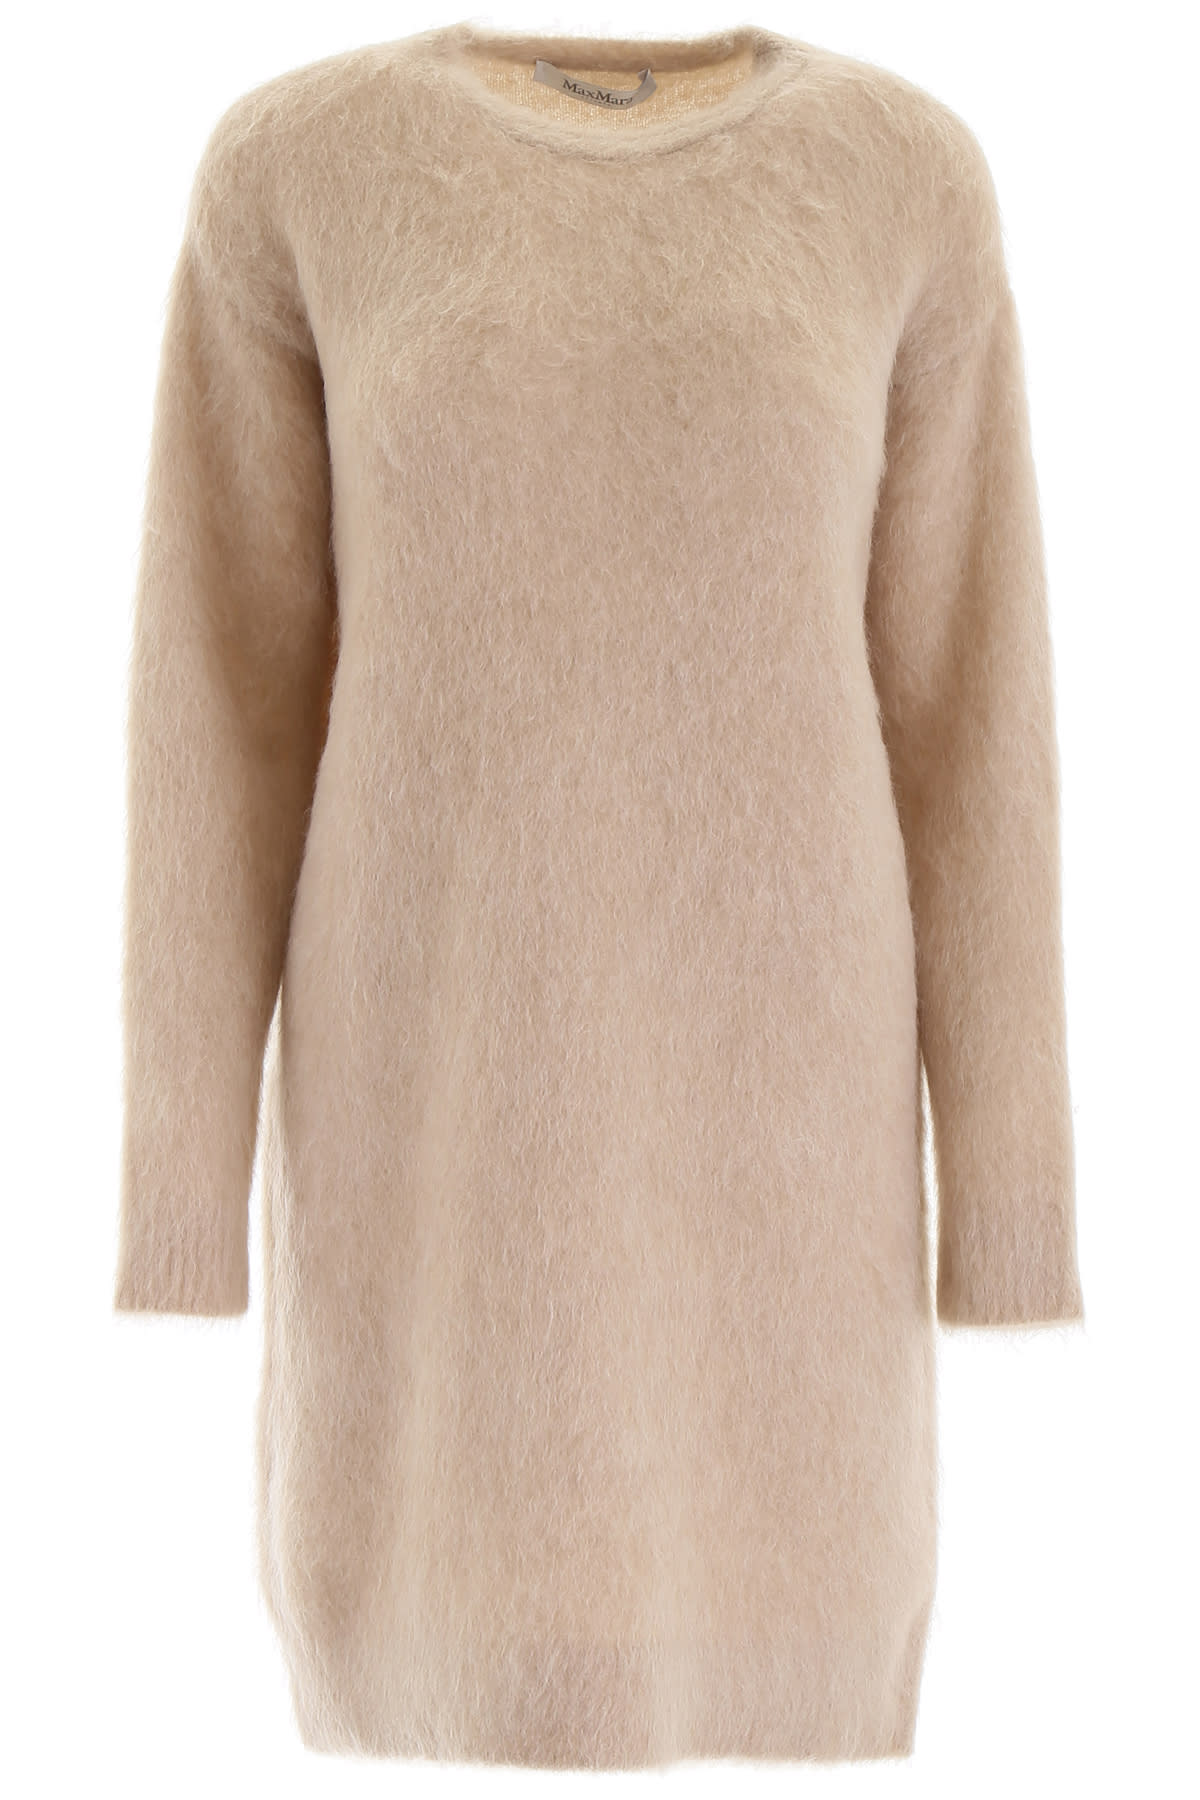 Max Mara Calte Mini Dress